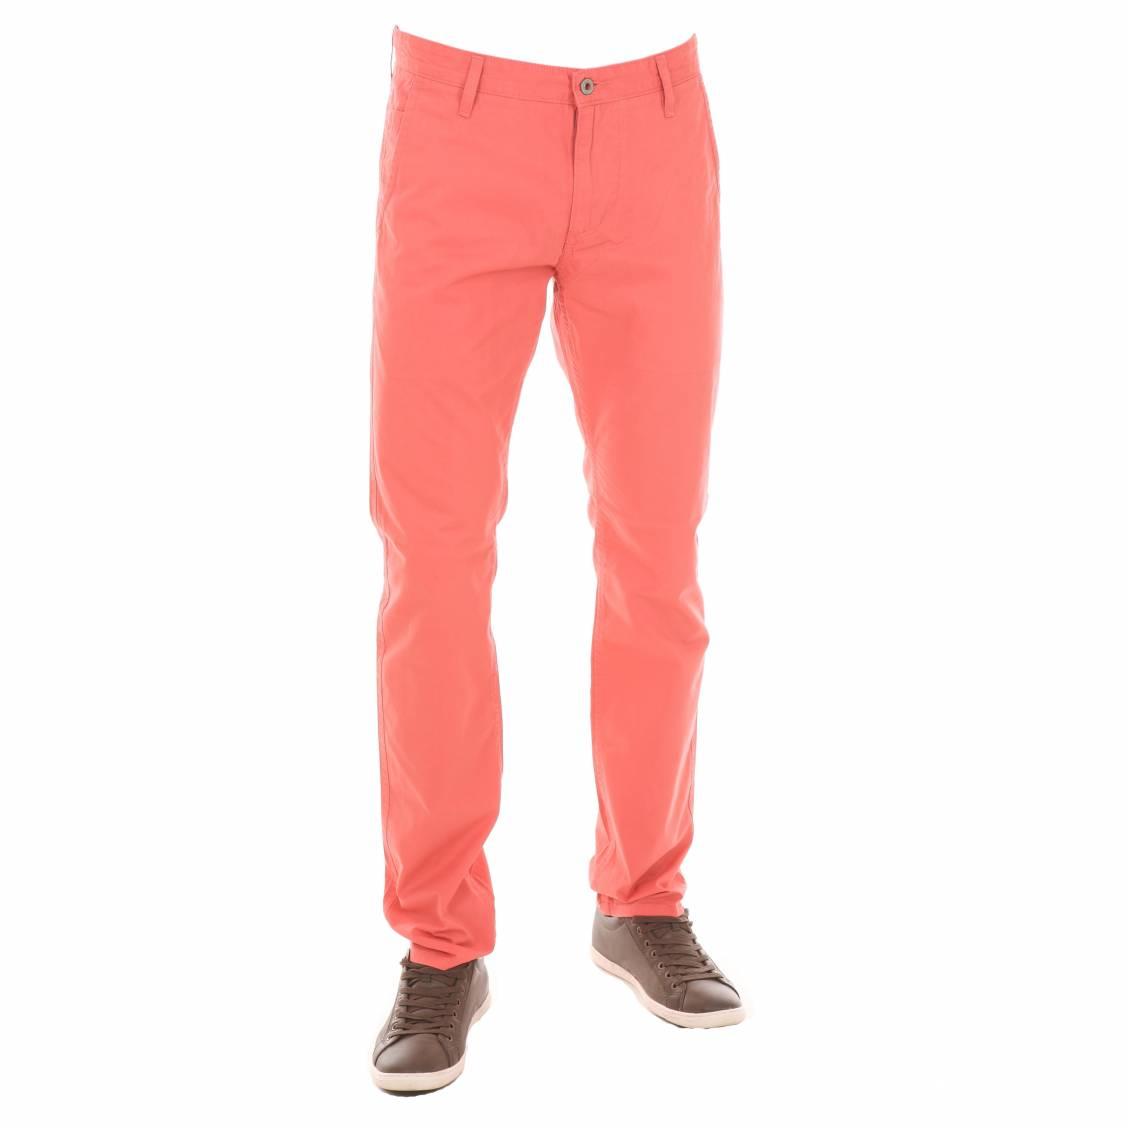 pantalon dockers alpha khaki fusel ajust rose p le rue des hommes. Black Bedroom Furniture Sets. Home Design Ideas